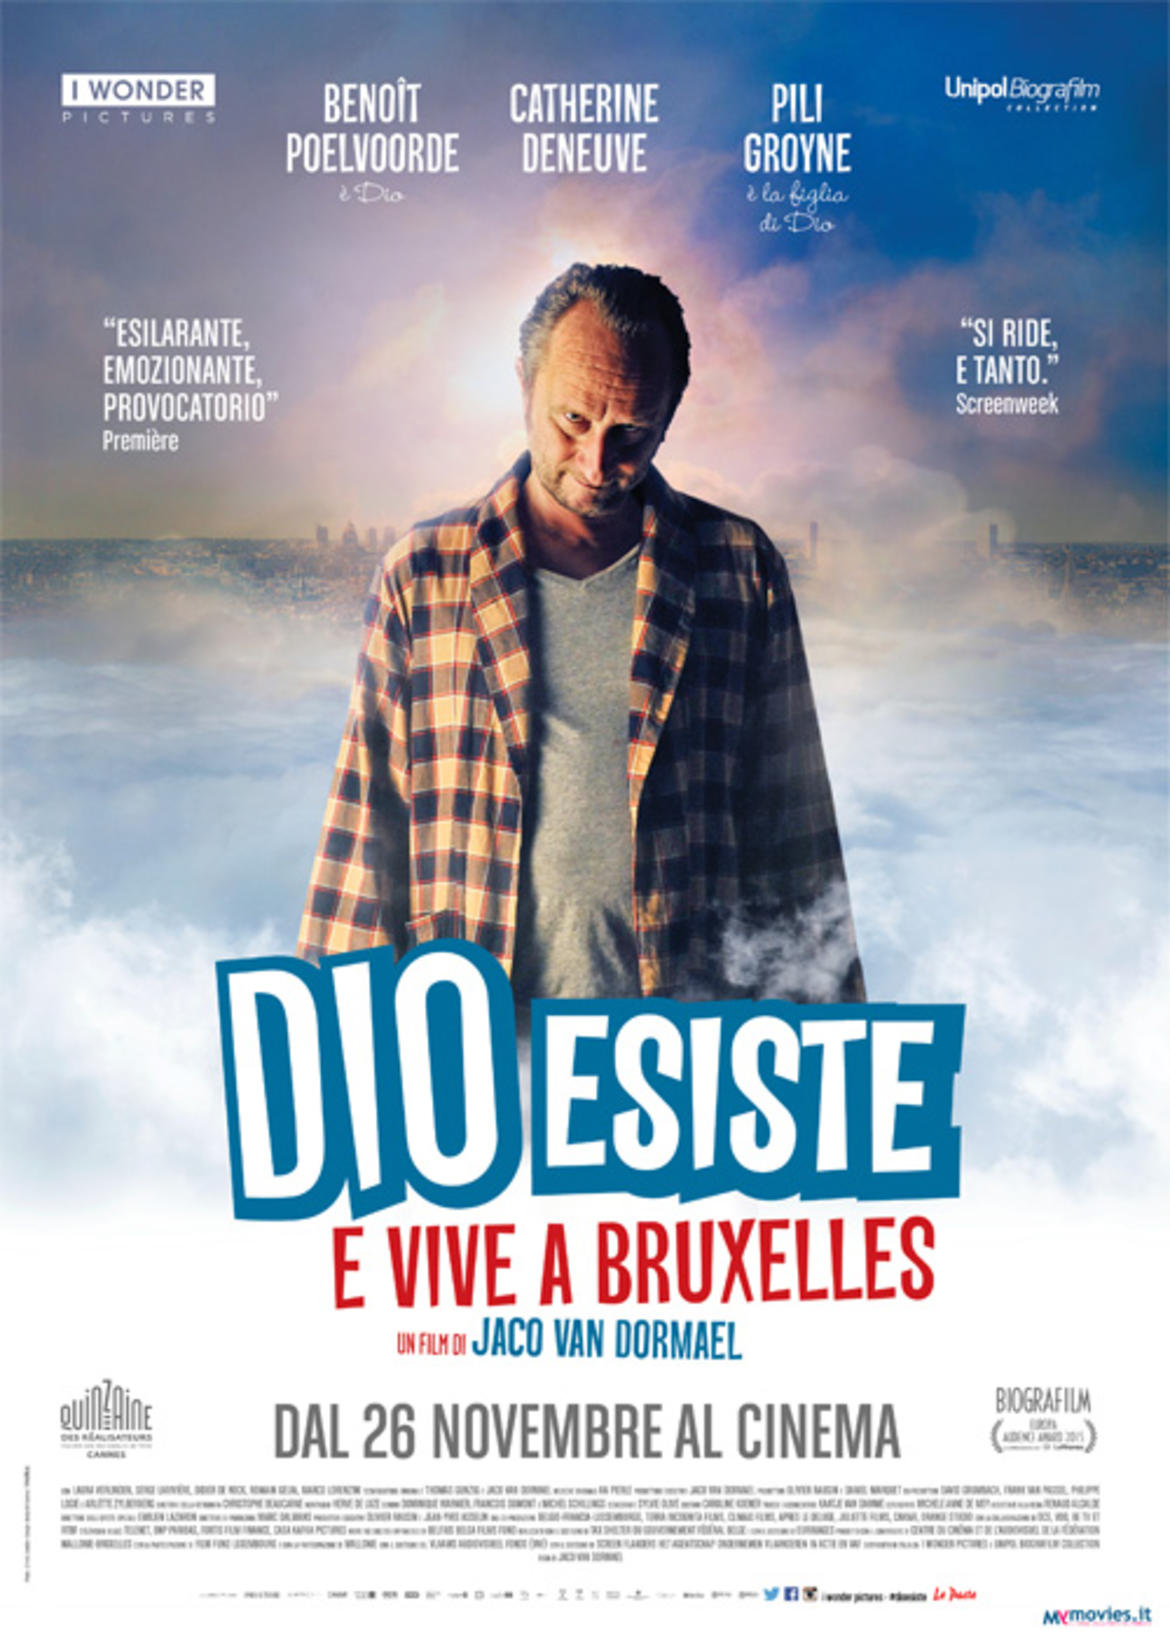 Dio-esiste-e-vive-a-Bruxelles_imagefullwide